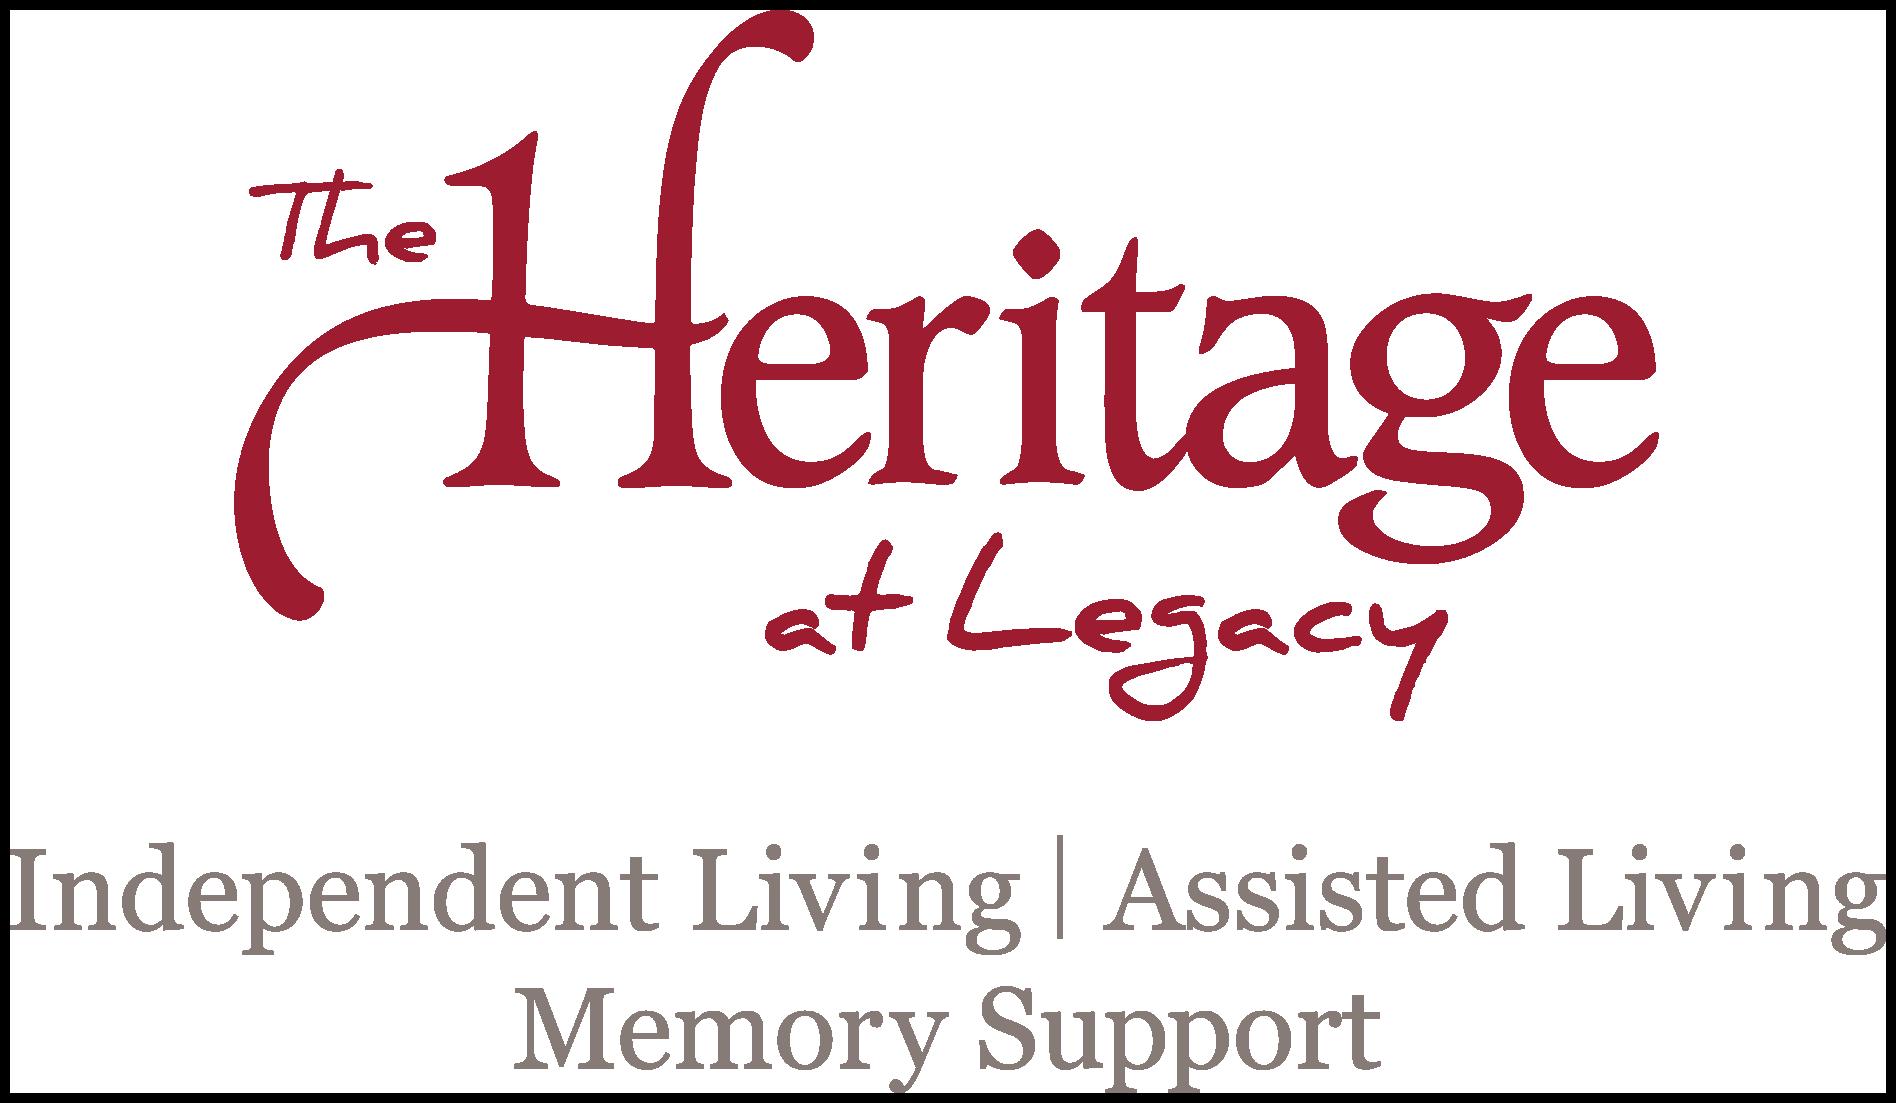 Heritage_Legacy_logo